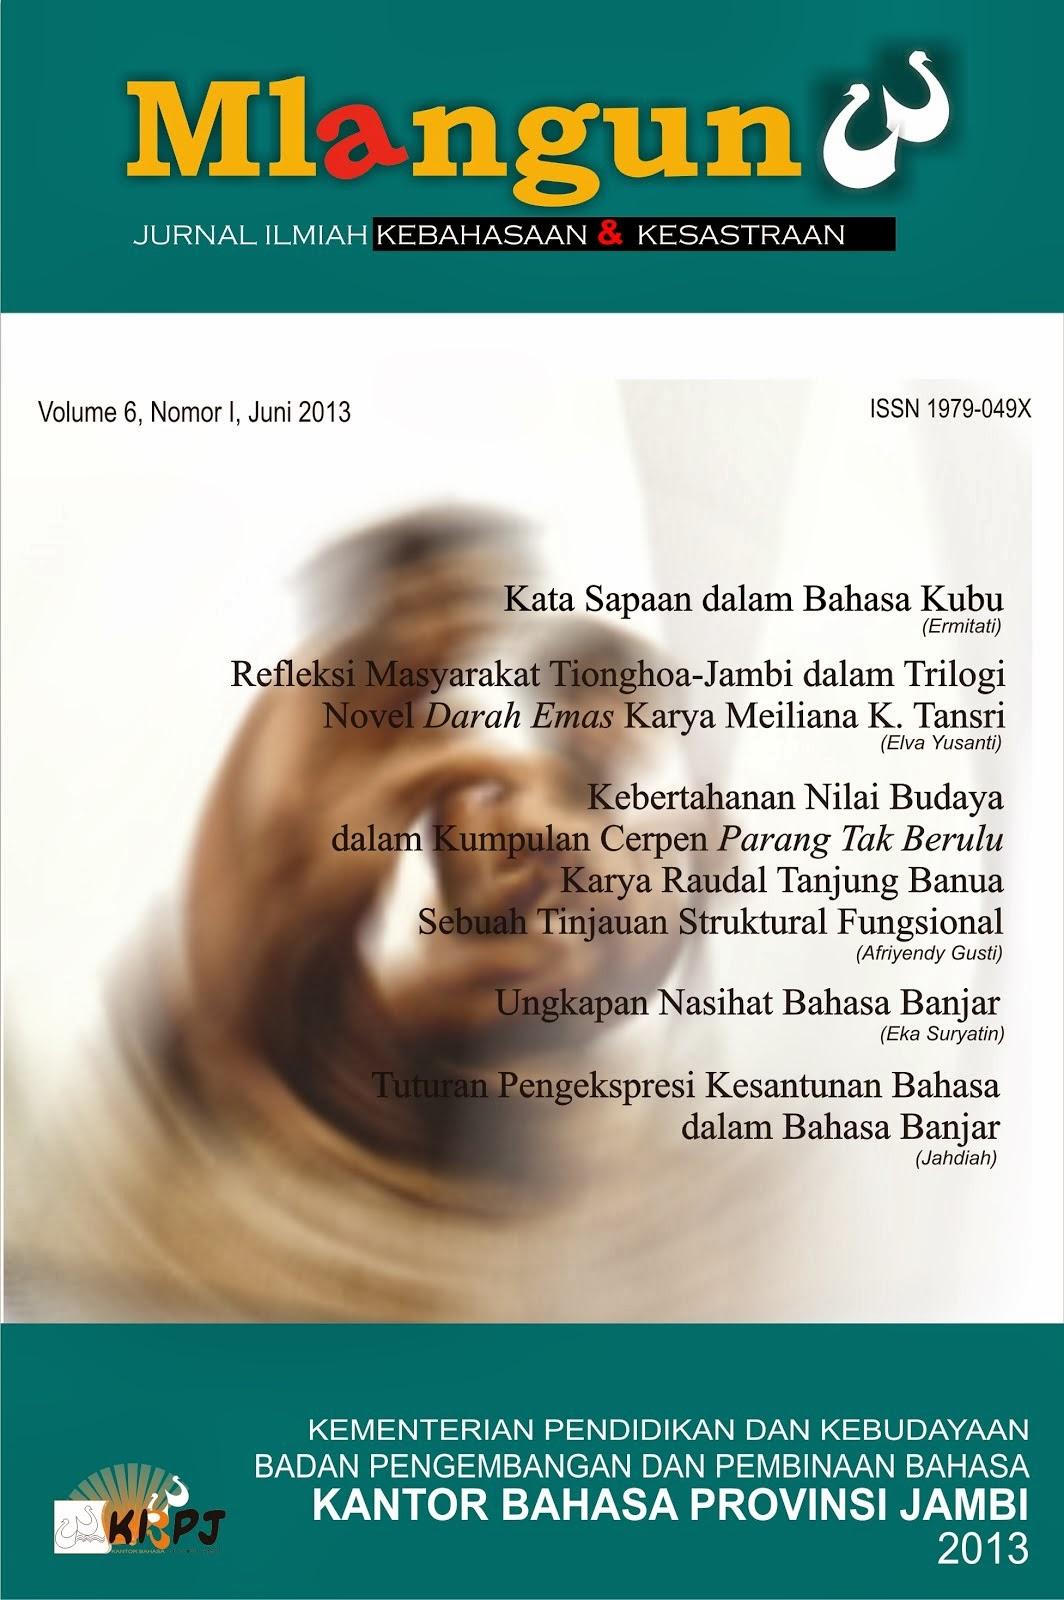 Volume 6, Nomor I, Juni 2013